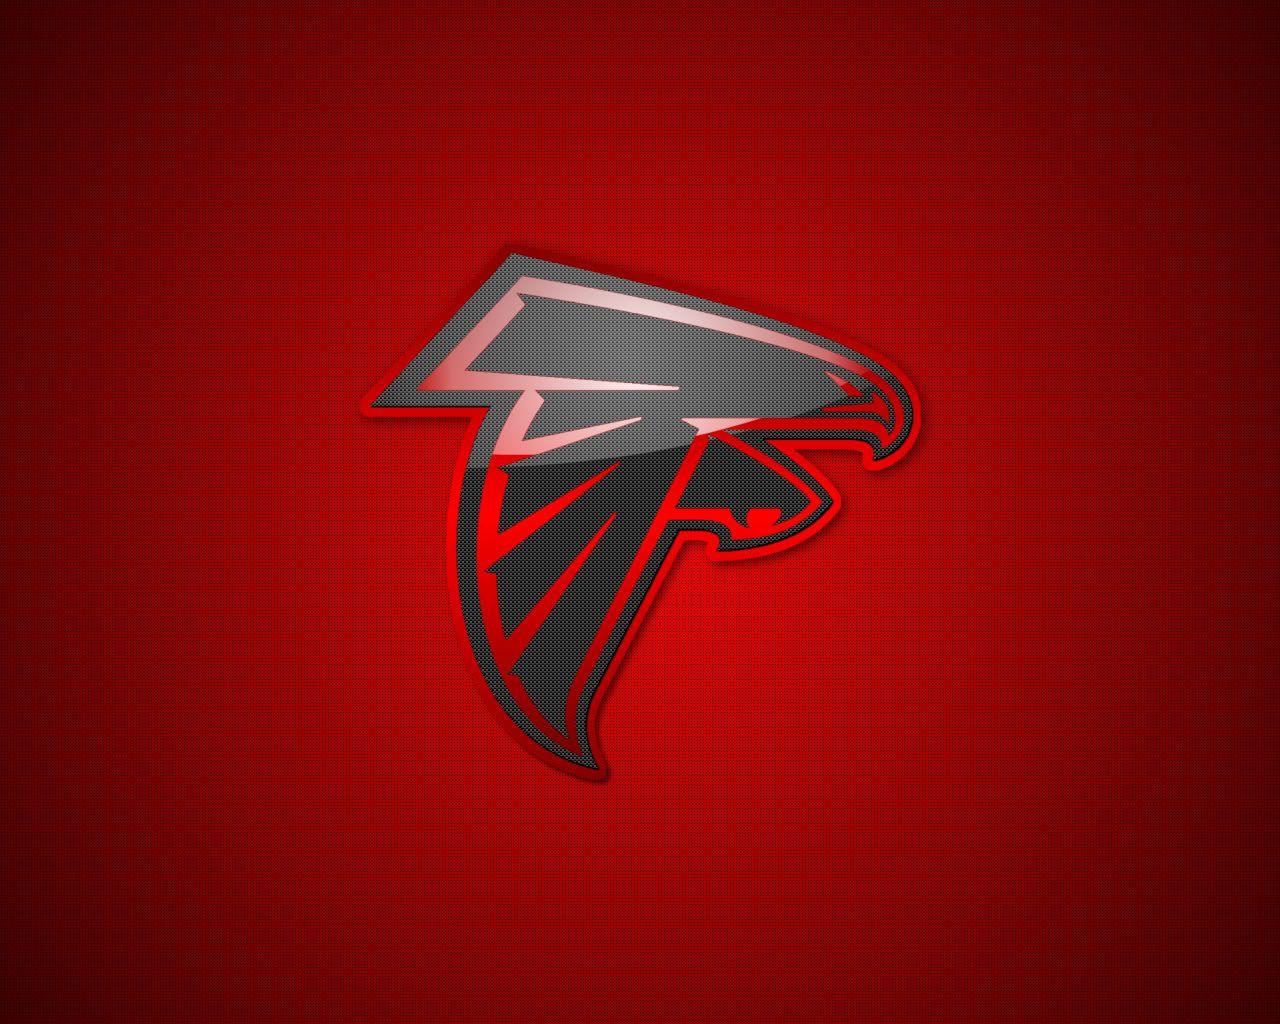 Collection of Atlanta Falcons Logo Wallpaper on HDWallpapers